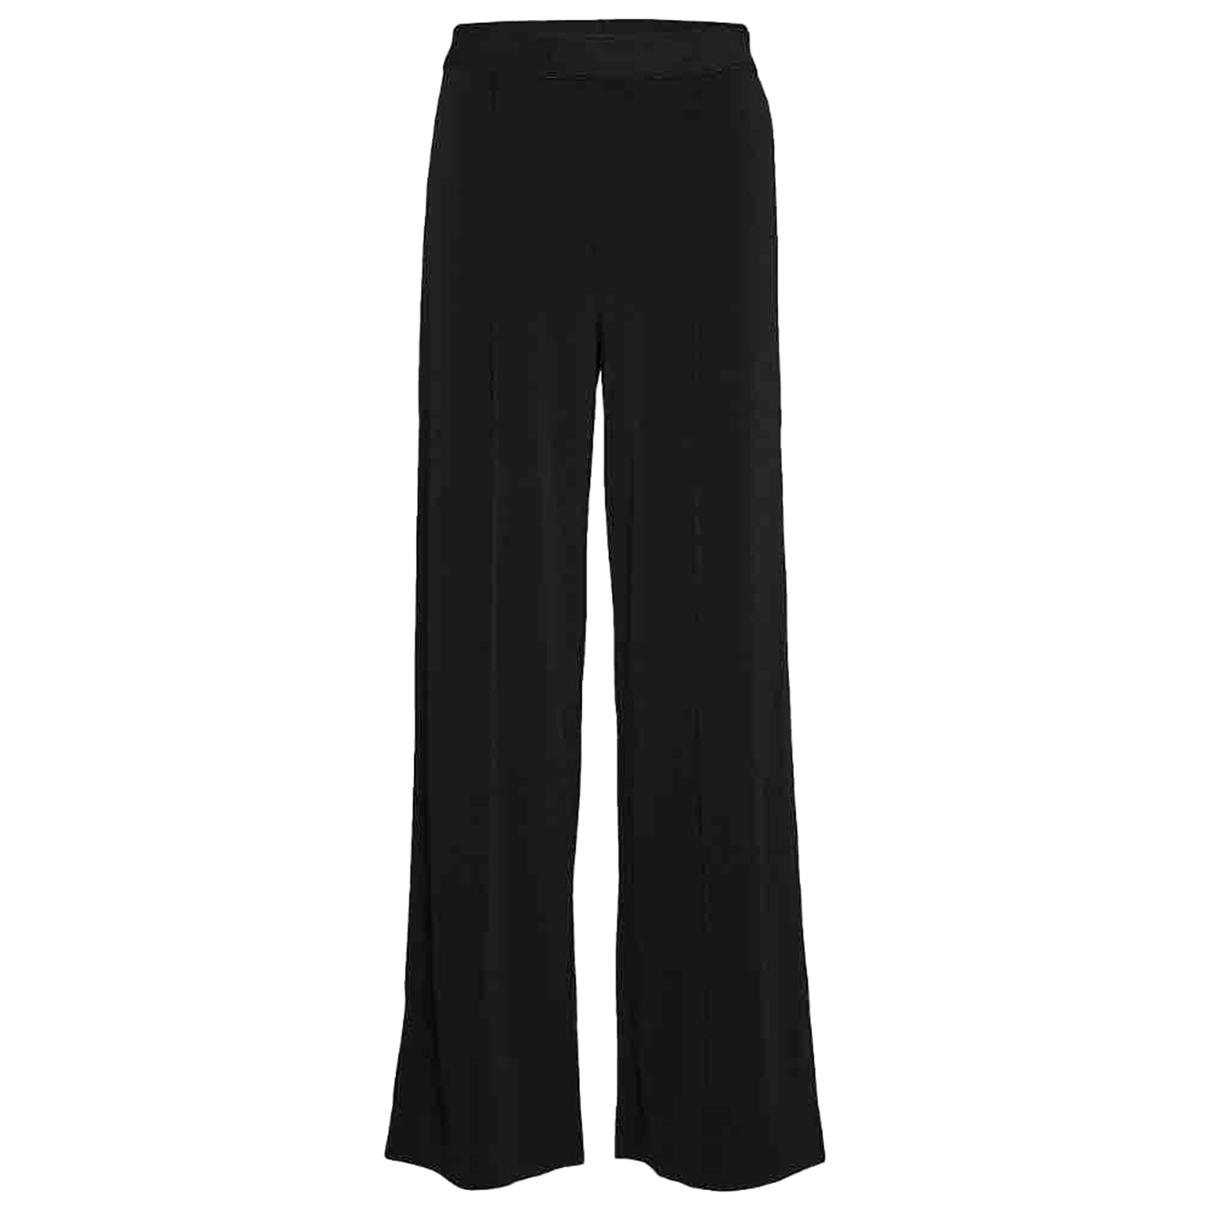 By Malene Birger \N Black Trousers for Women S International